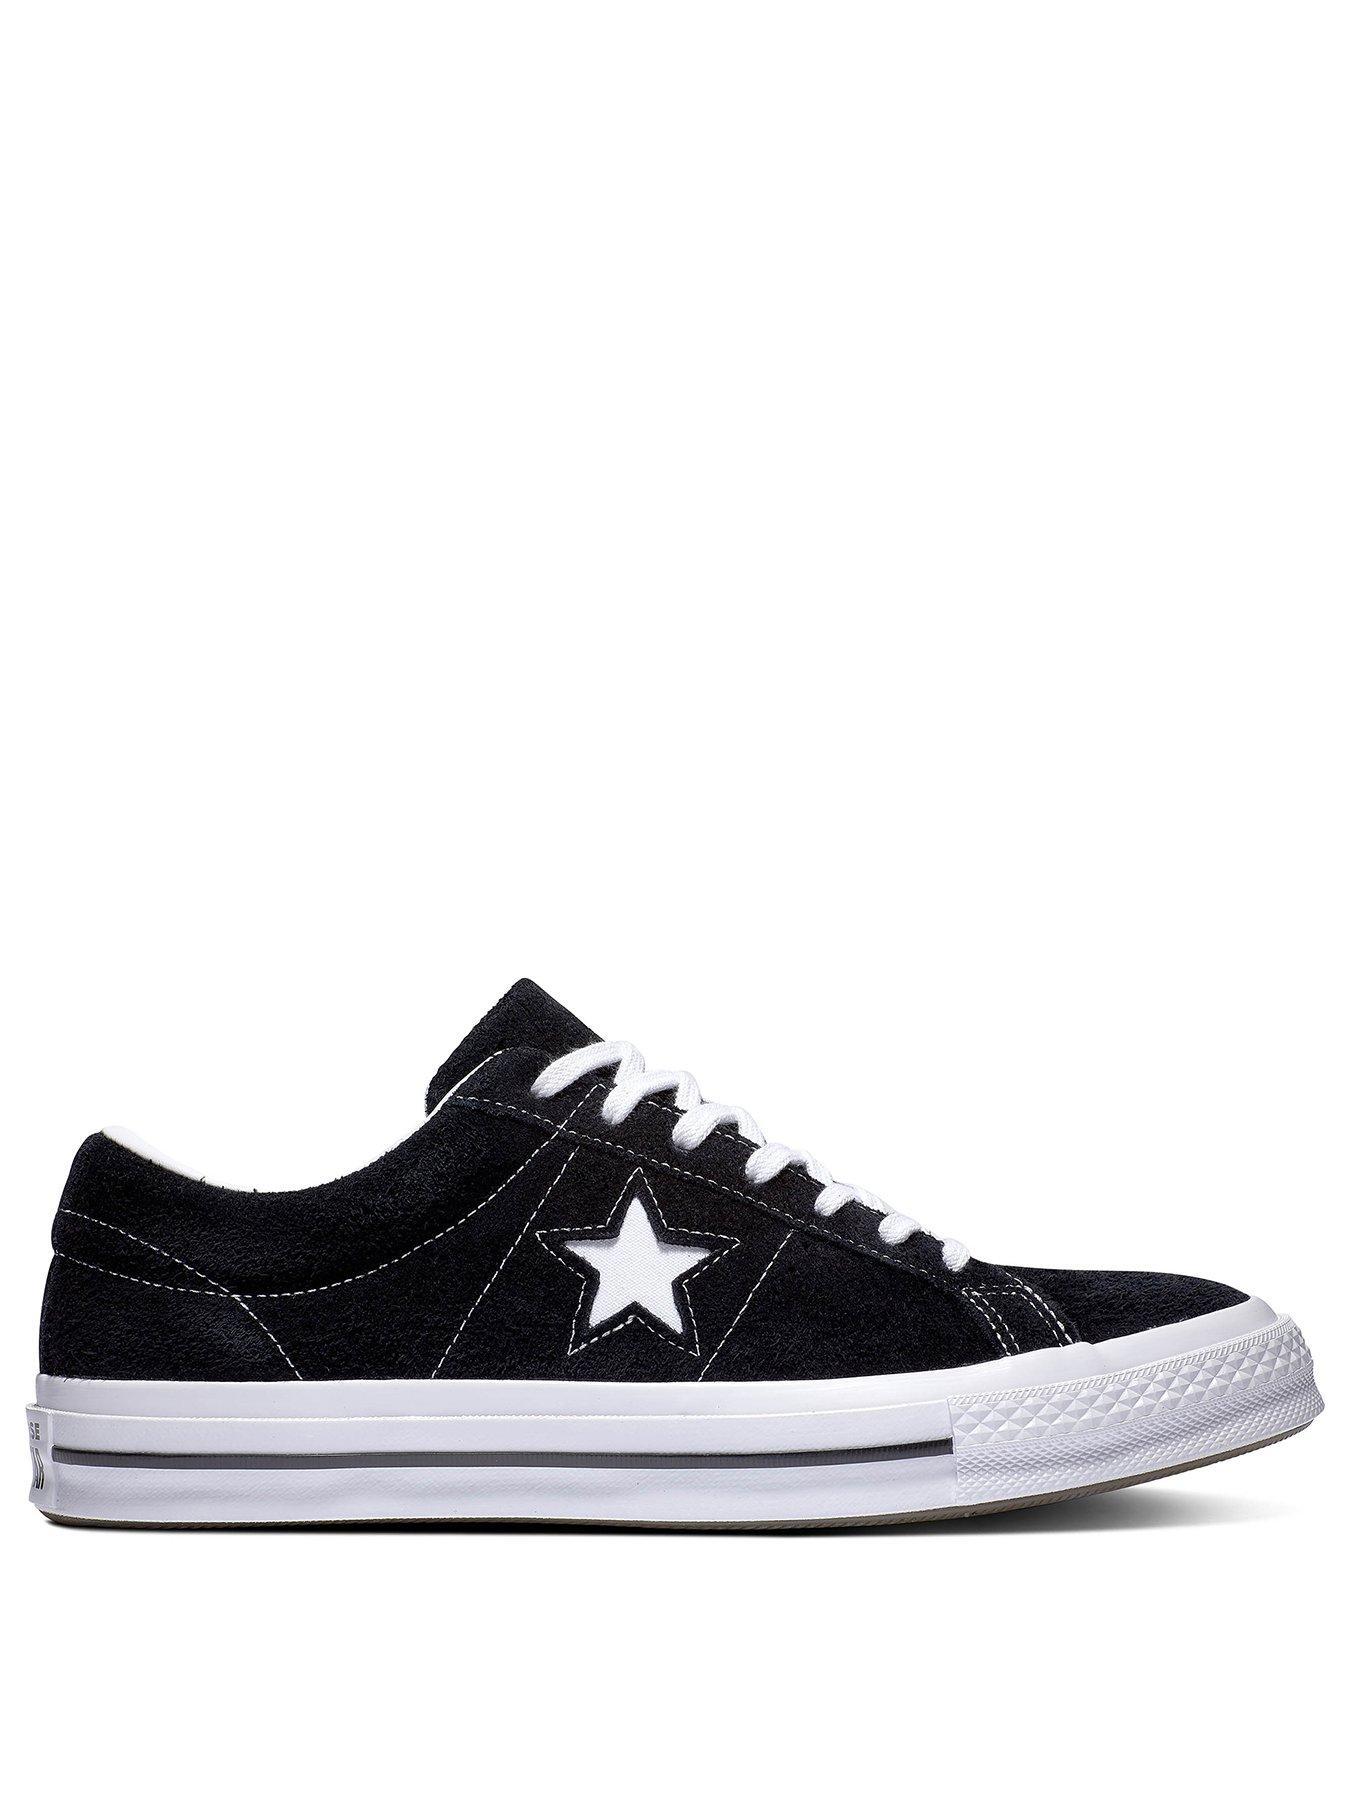 converse shoes ireland